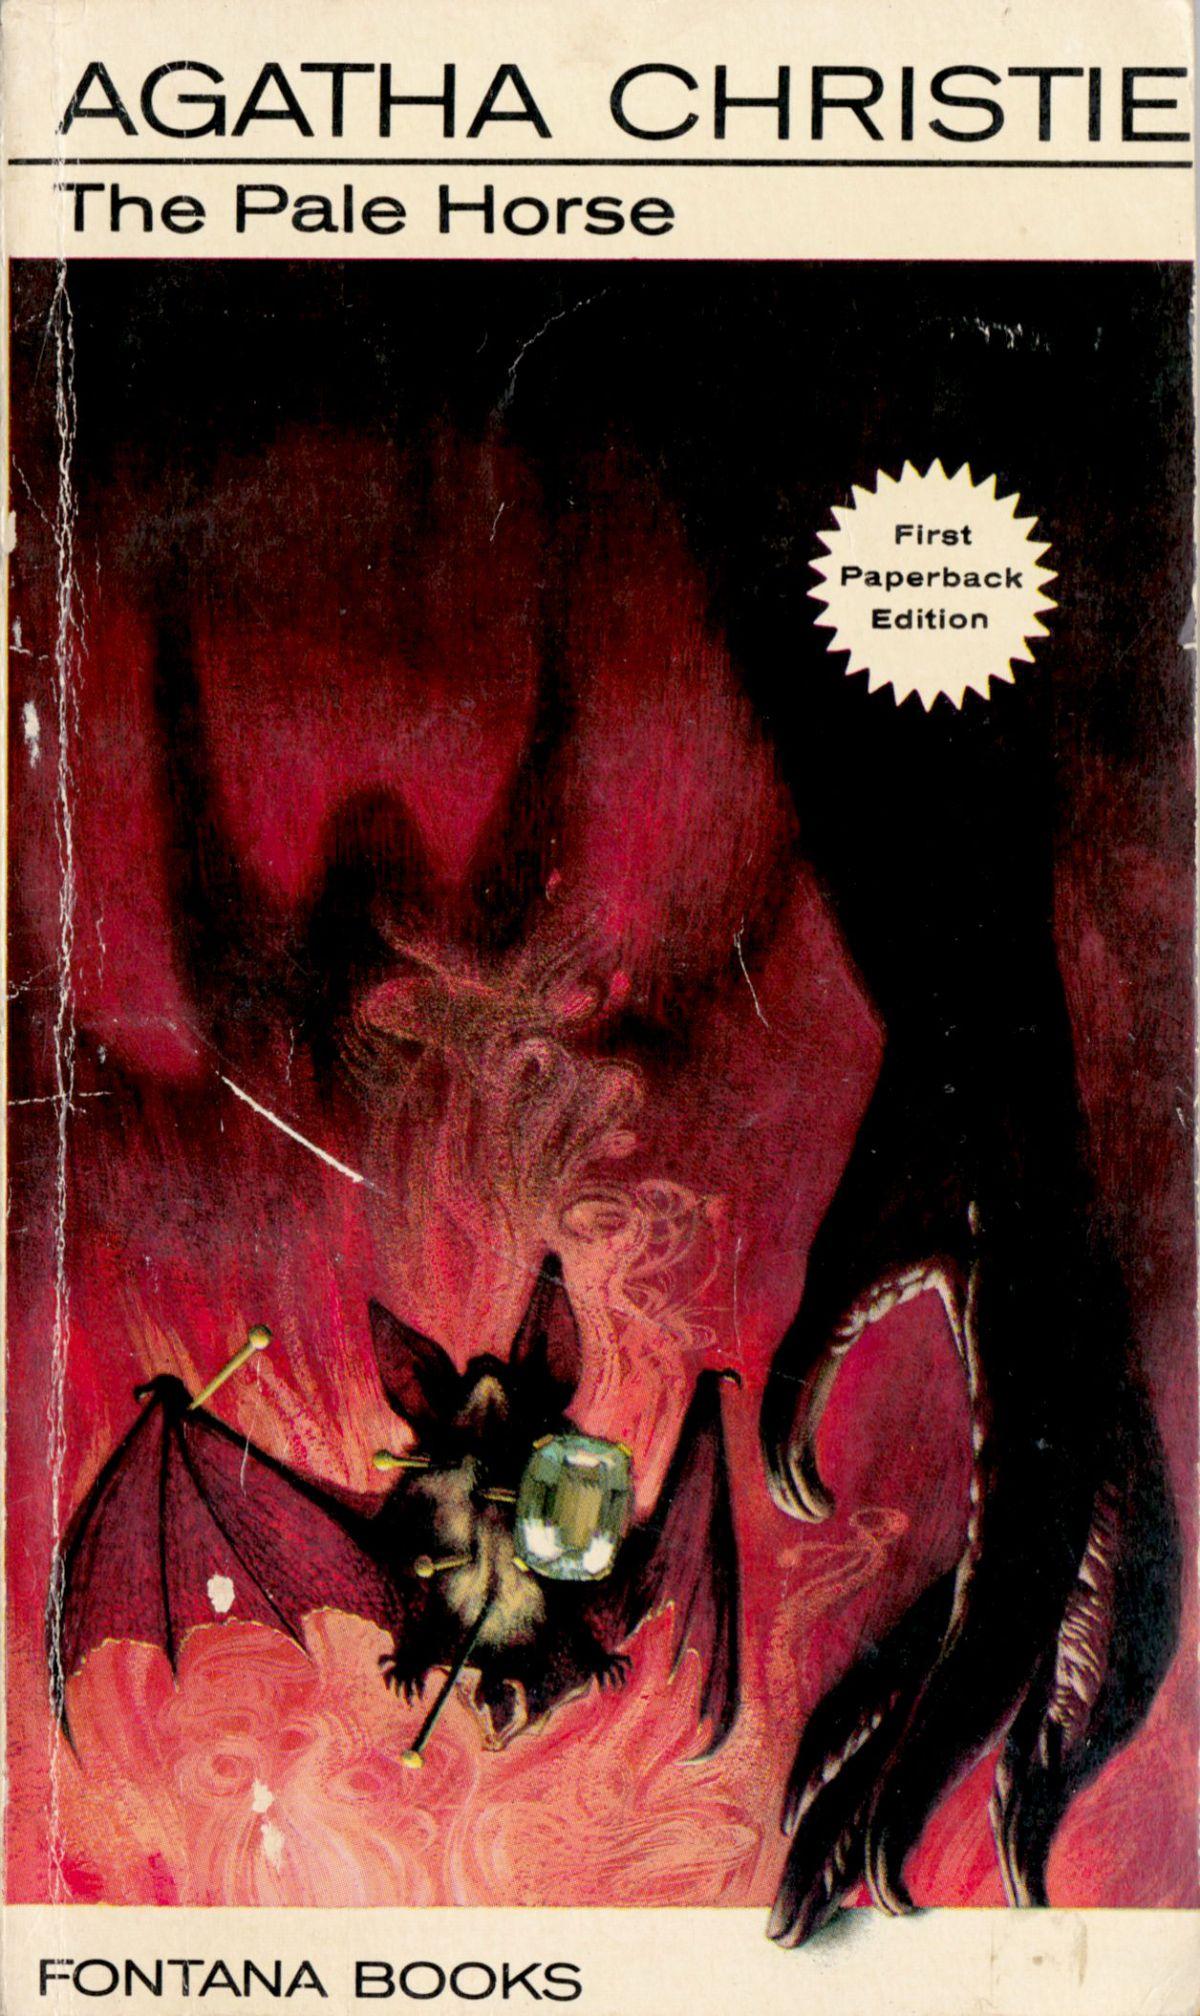 Agatha Christie Tom Adams The Pale Horse Fontana 1964